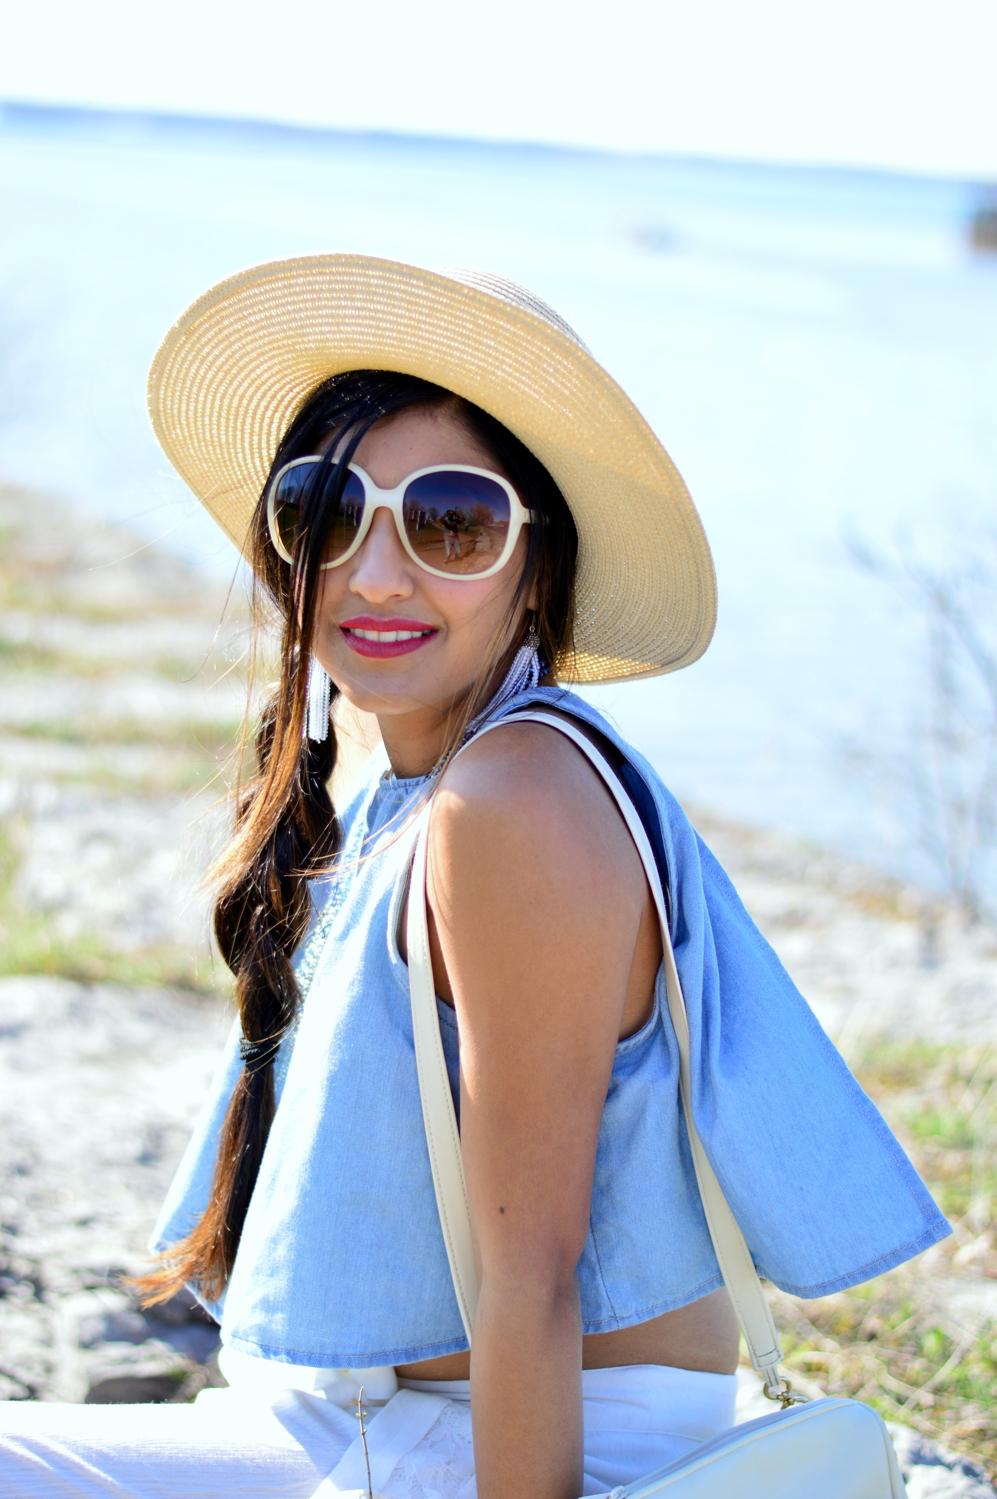 denim-crop-top-beach-style-blogger-summer-outfit 4